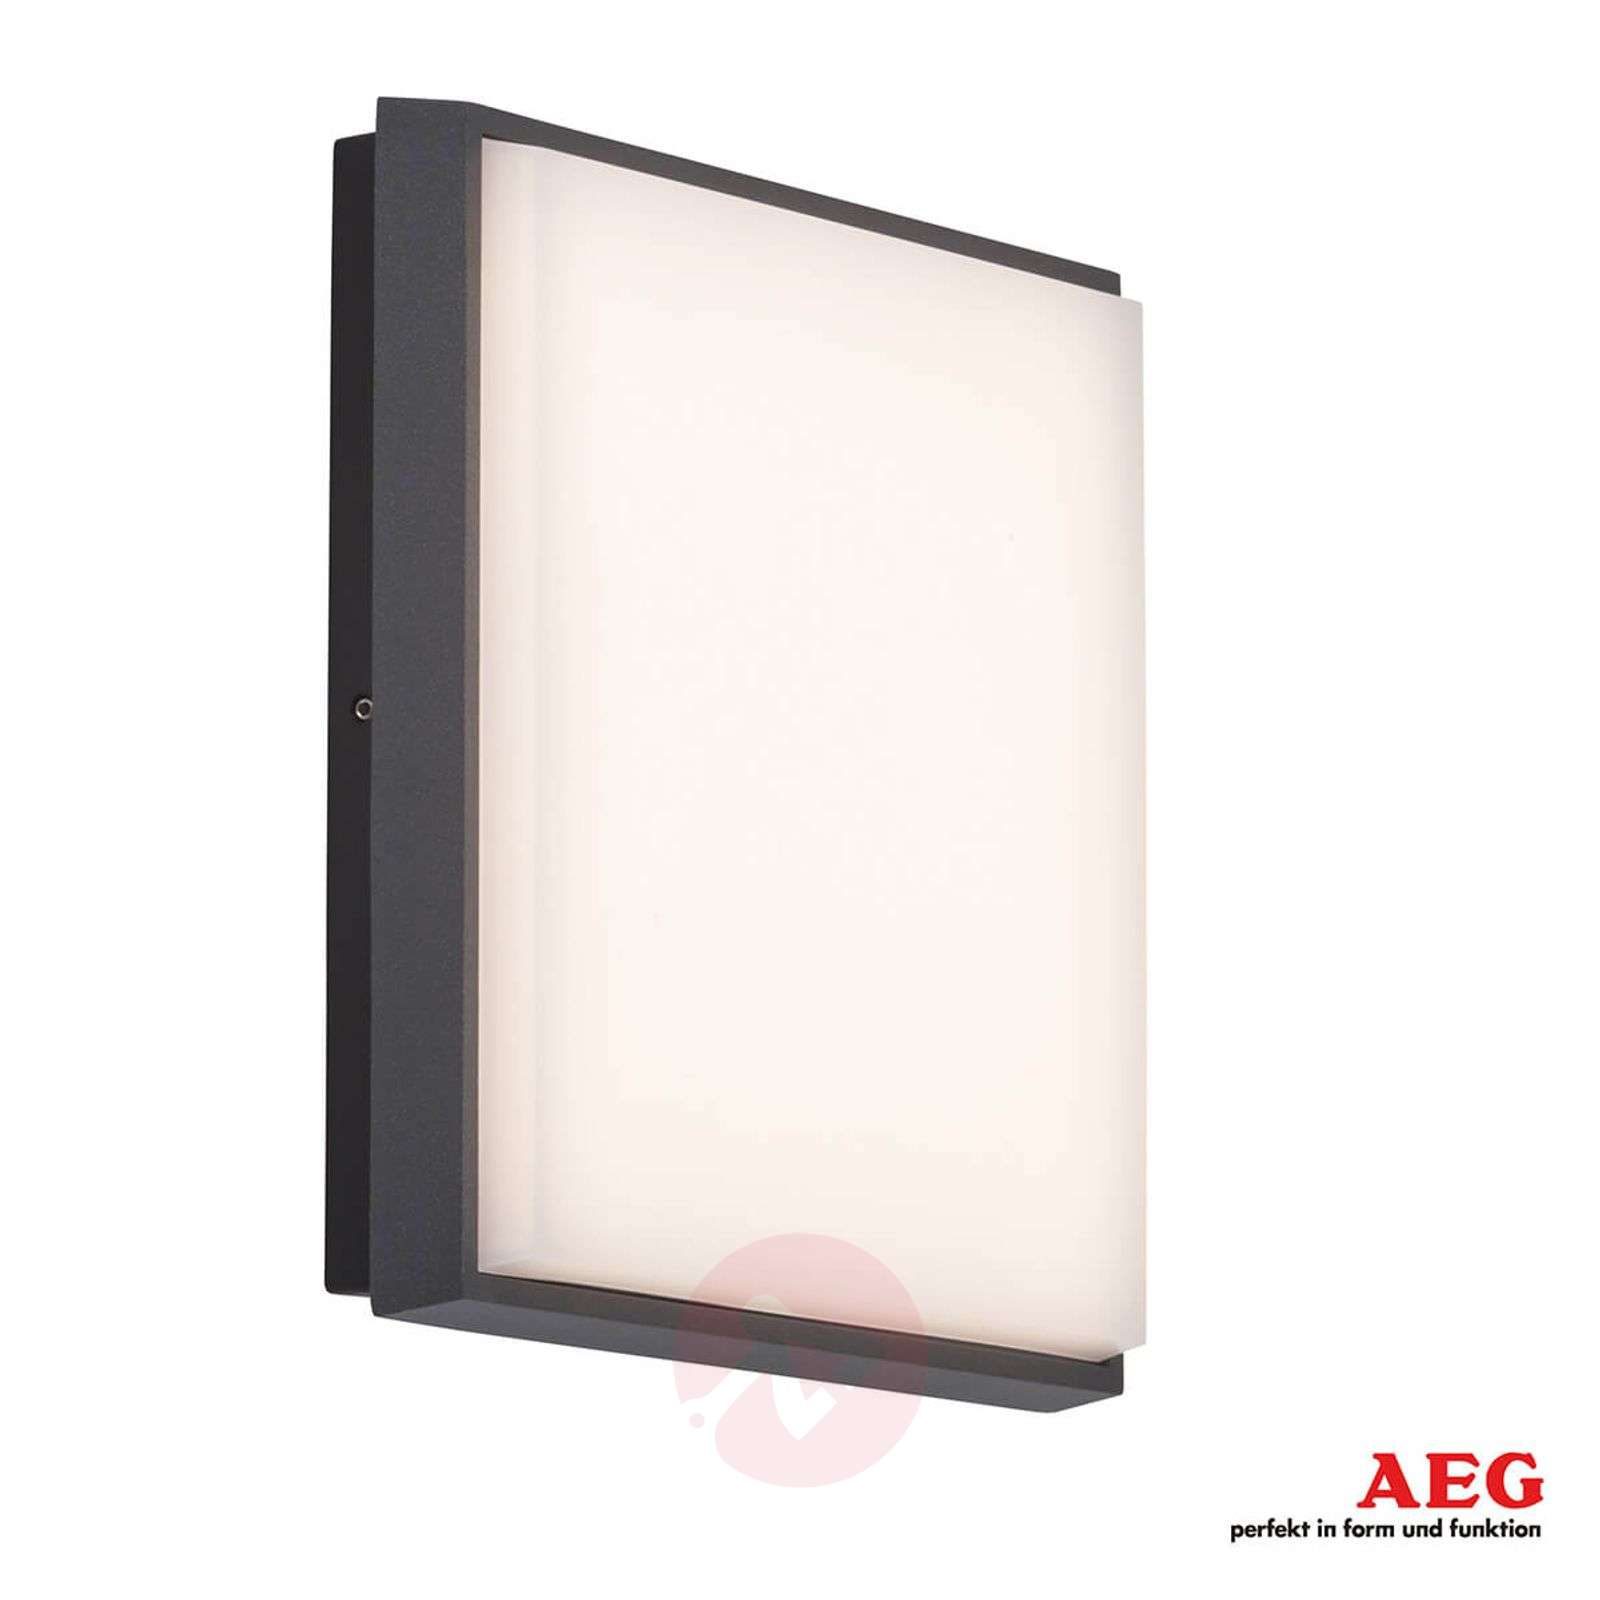 Kirkas LED-ulkoseinälamppu Letan Square 23 W-3057118-01